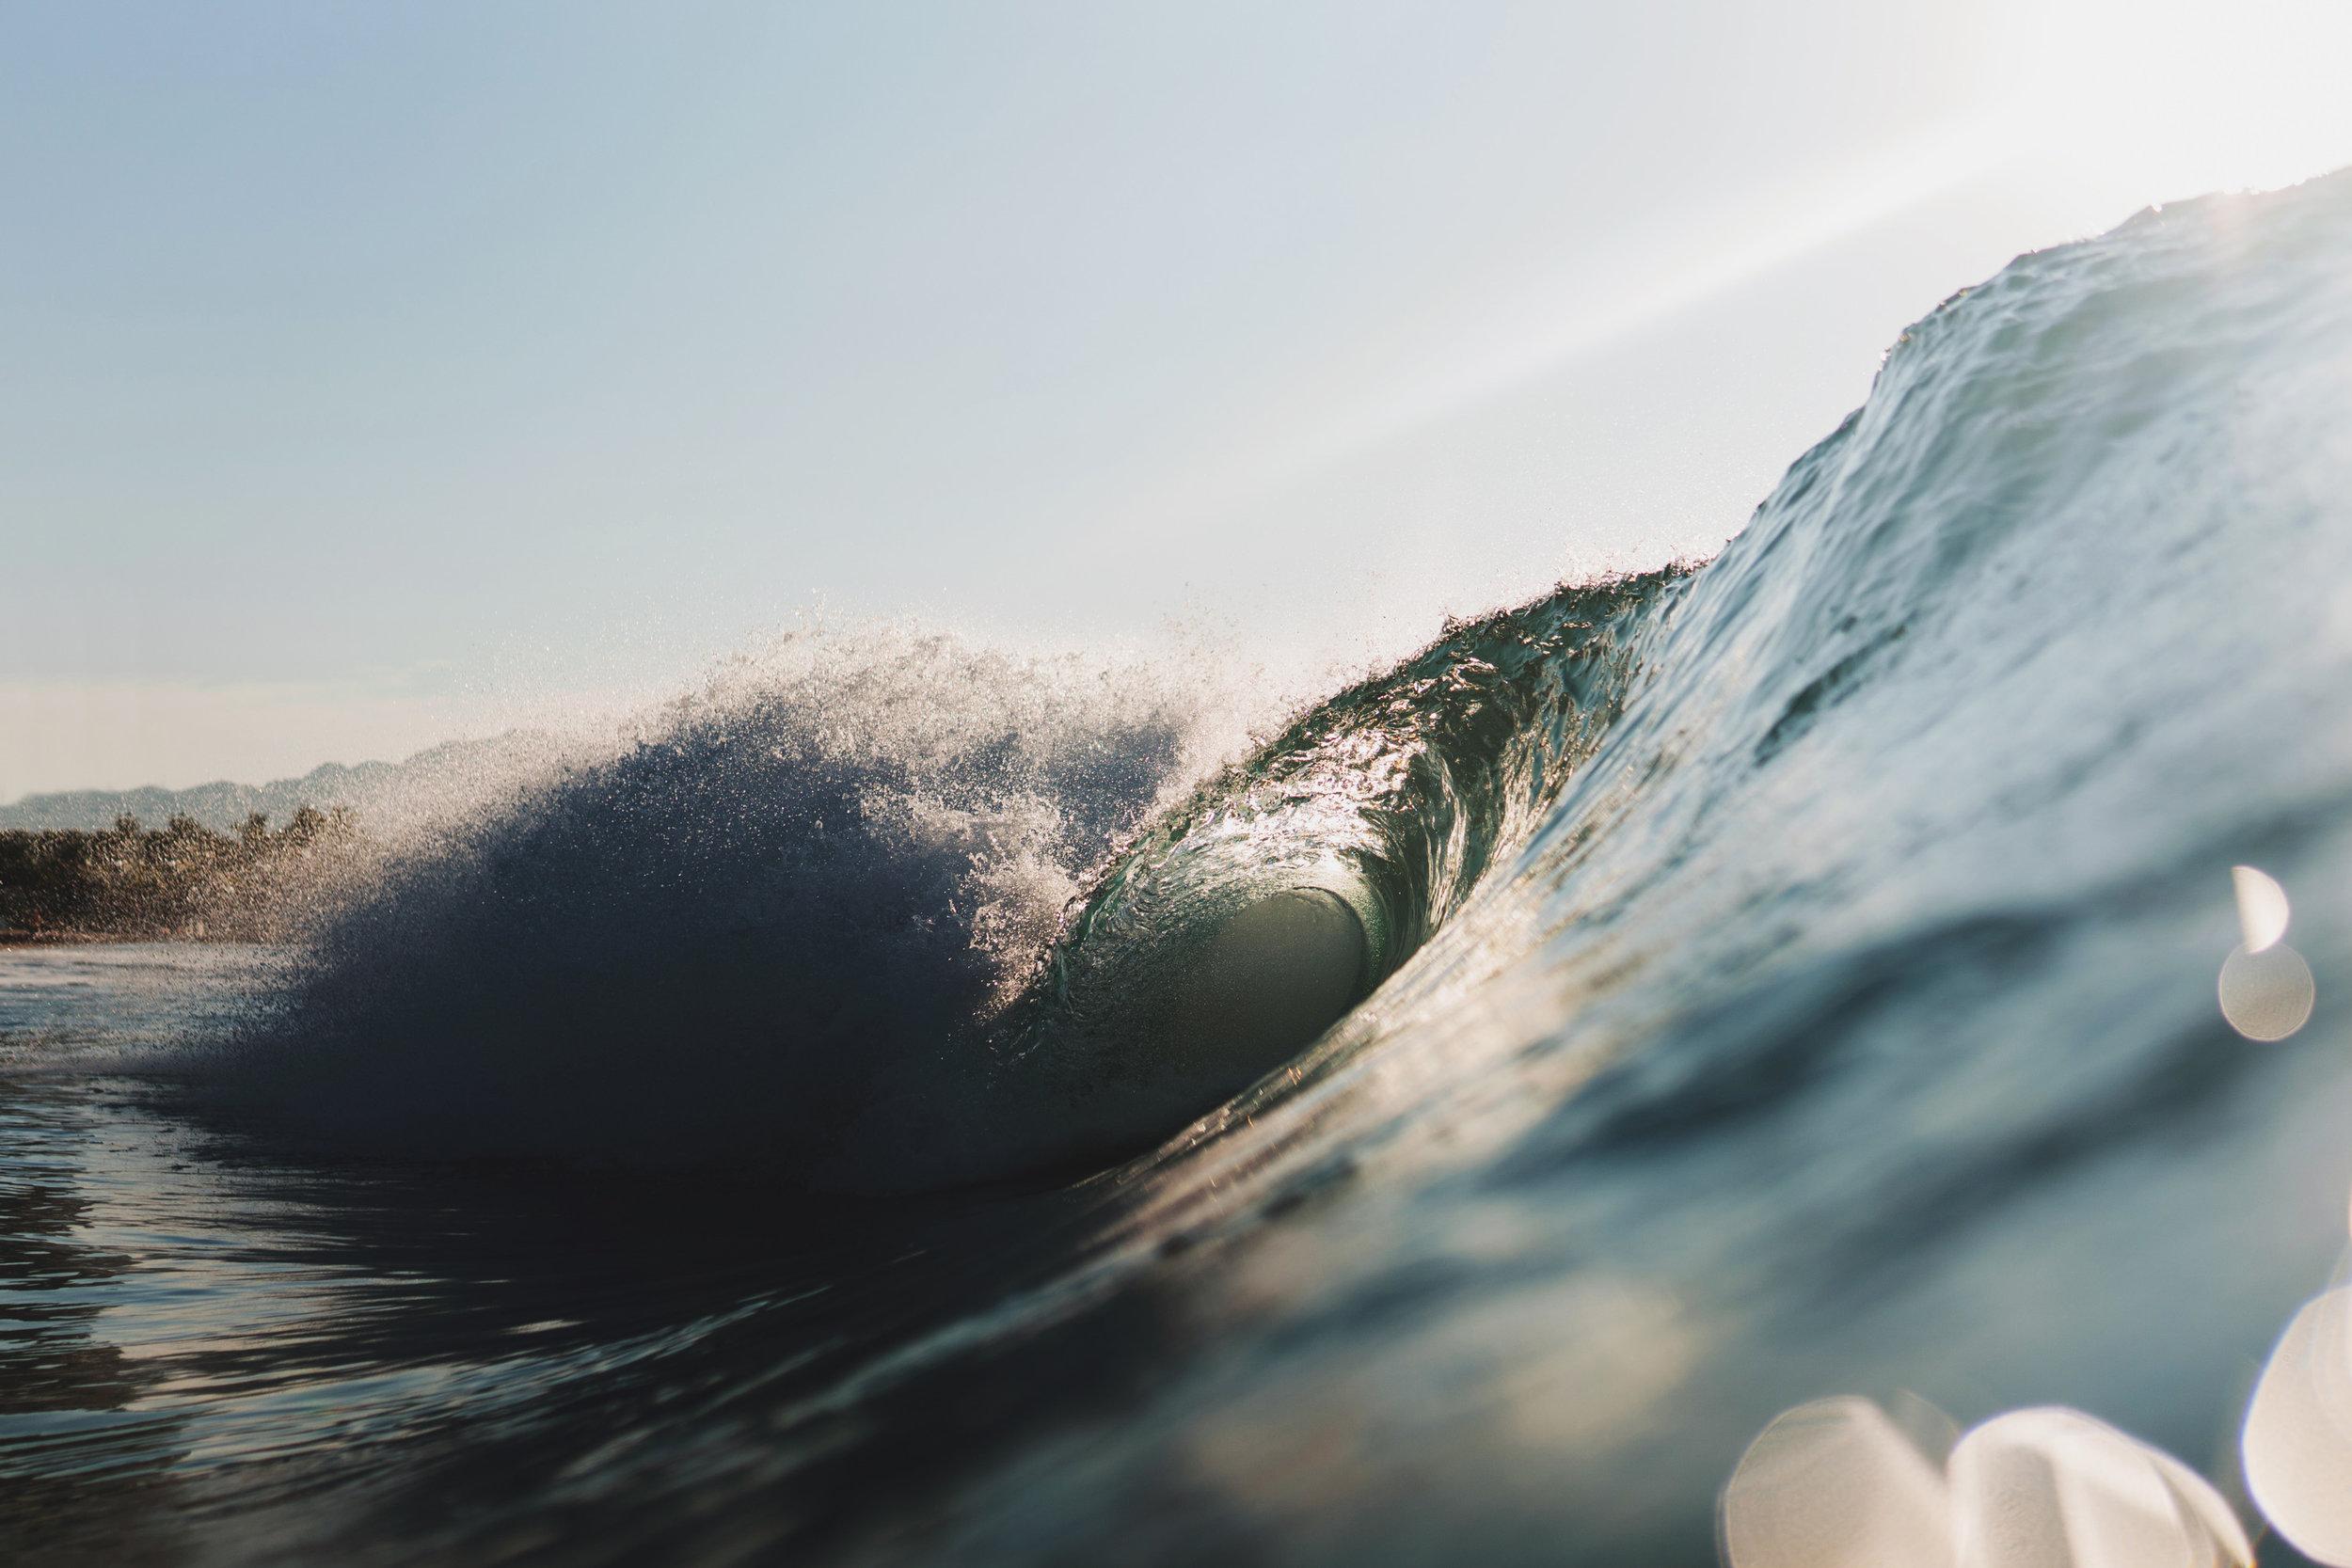 Surf-Mexico-Zihuatanejo-Sayulita-Ixtapa-Zihuatanejo-Diego-Cadena-Olas-Fotografia-Heiko-Bothe-48.jpg